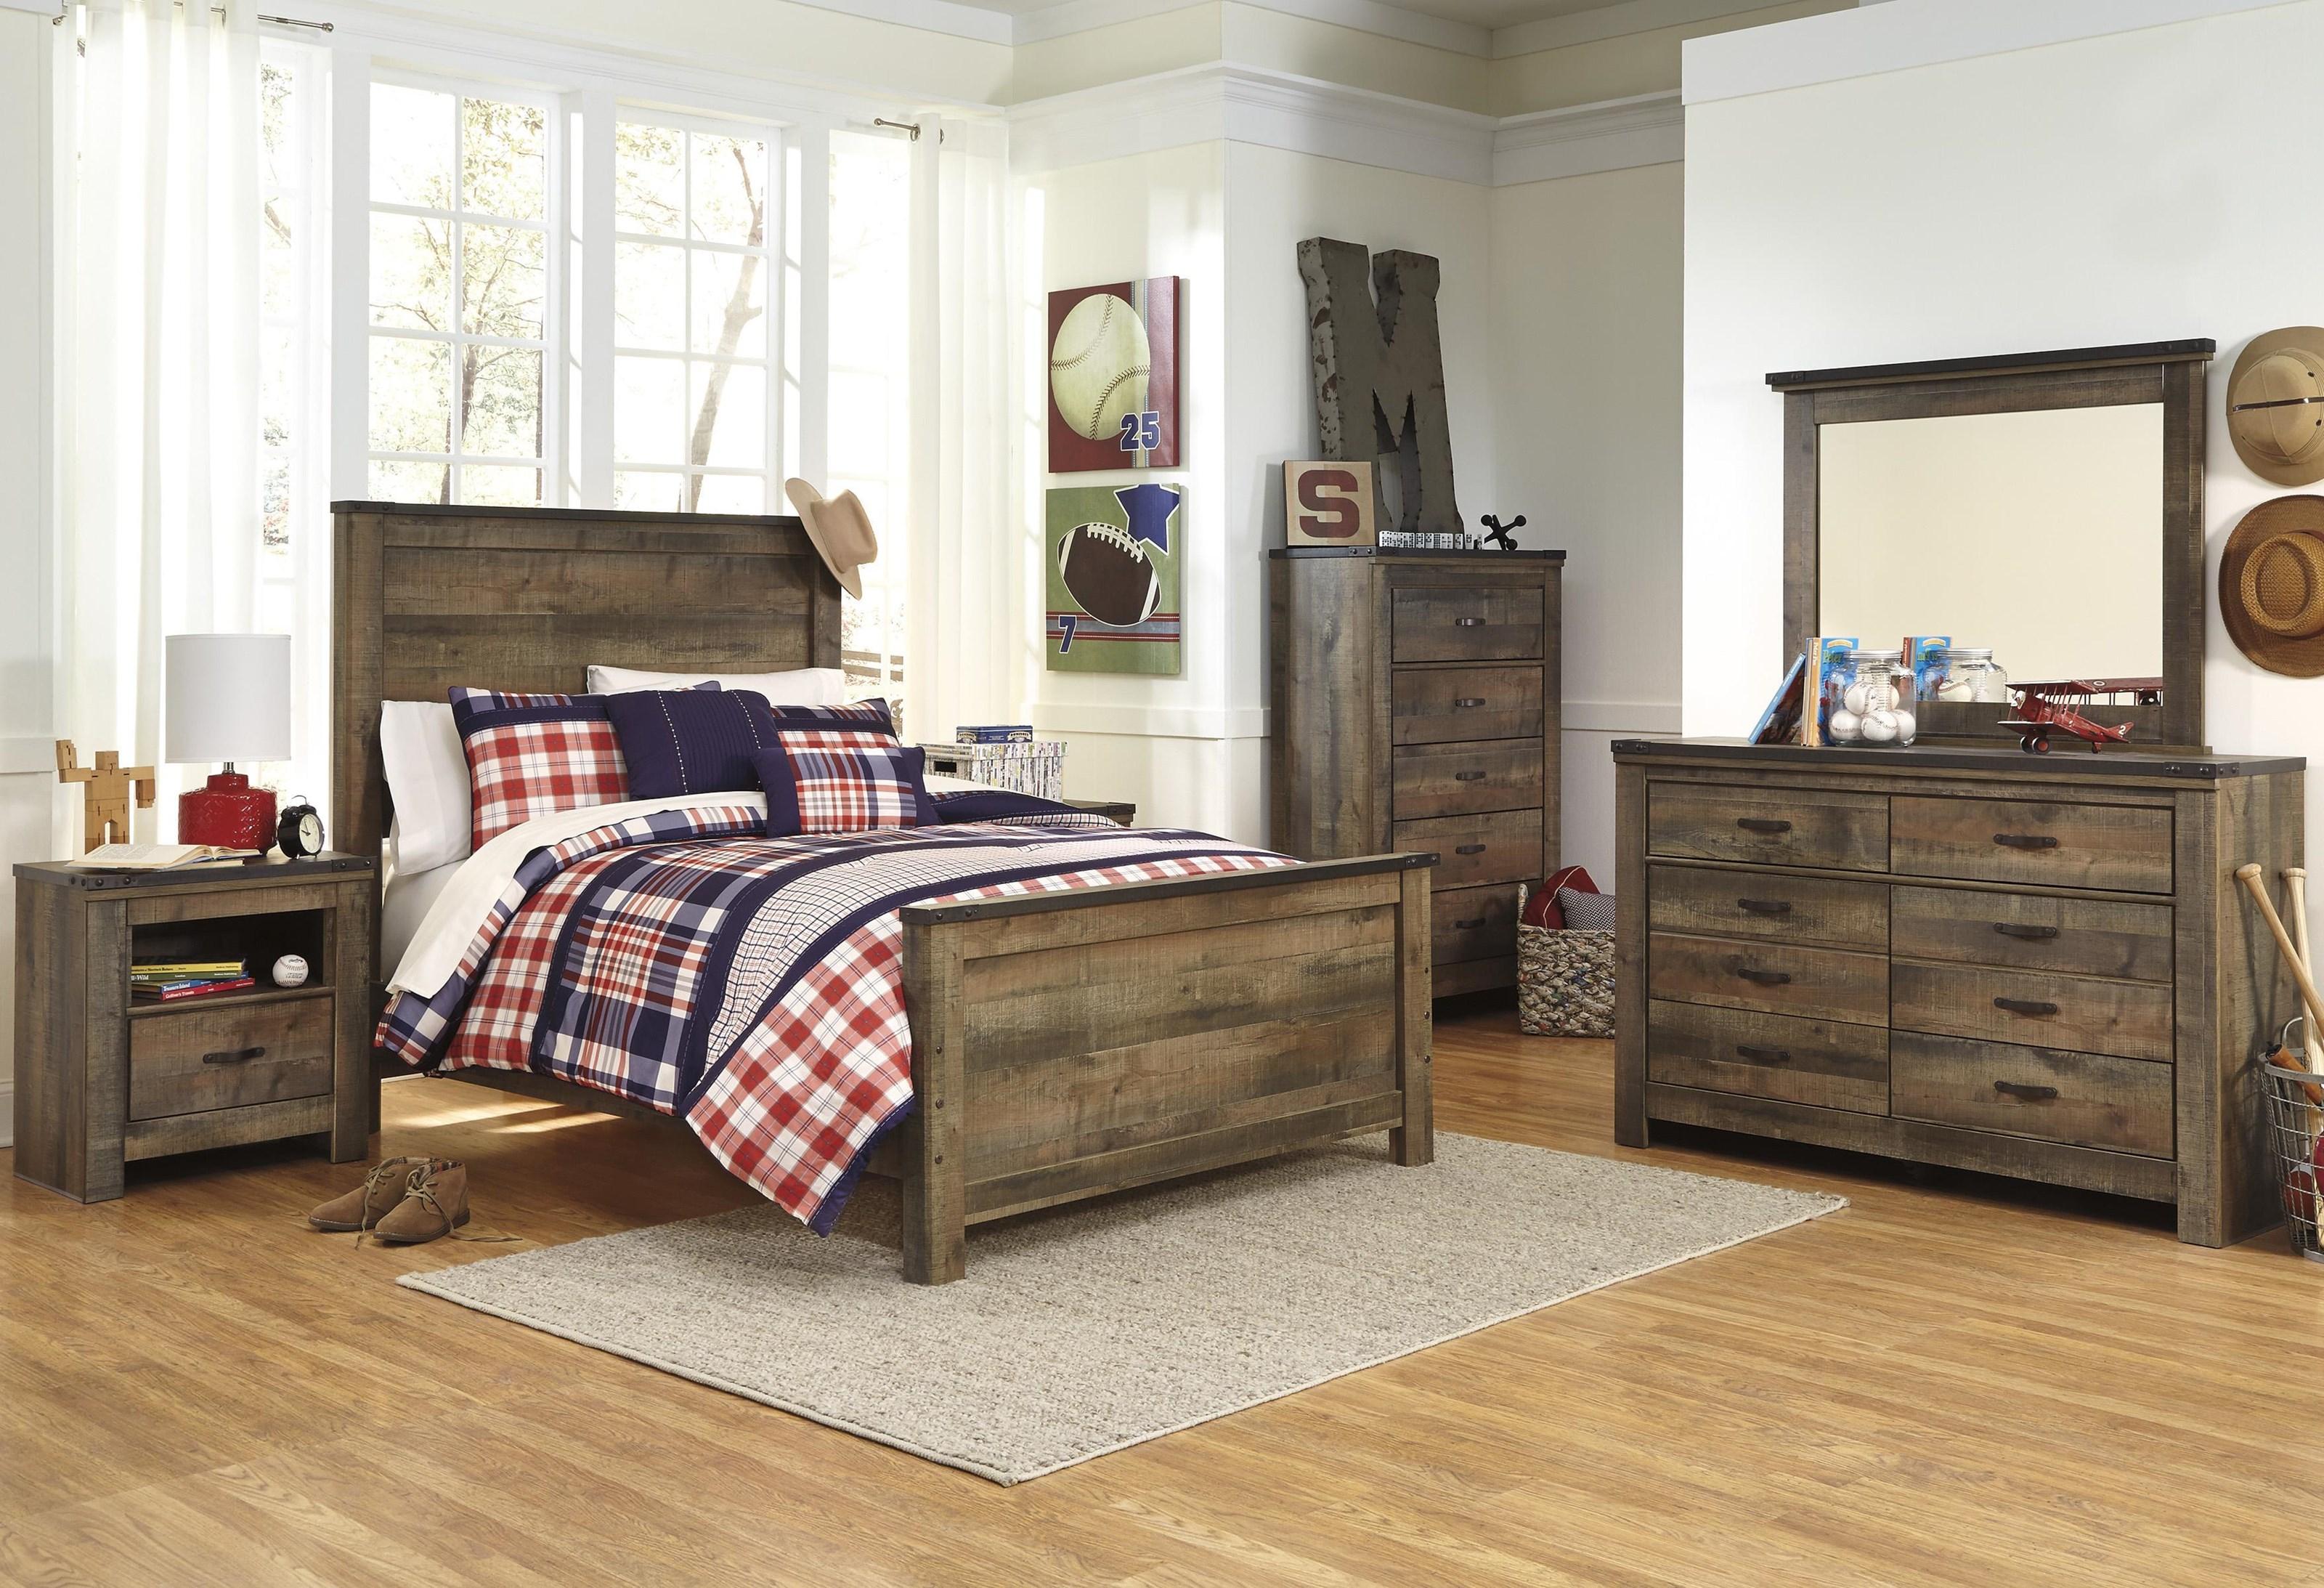 Full 5 Piece Bedroom Group